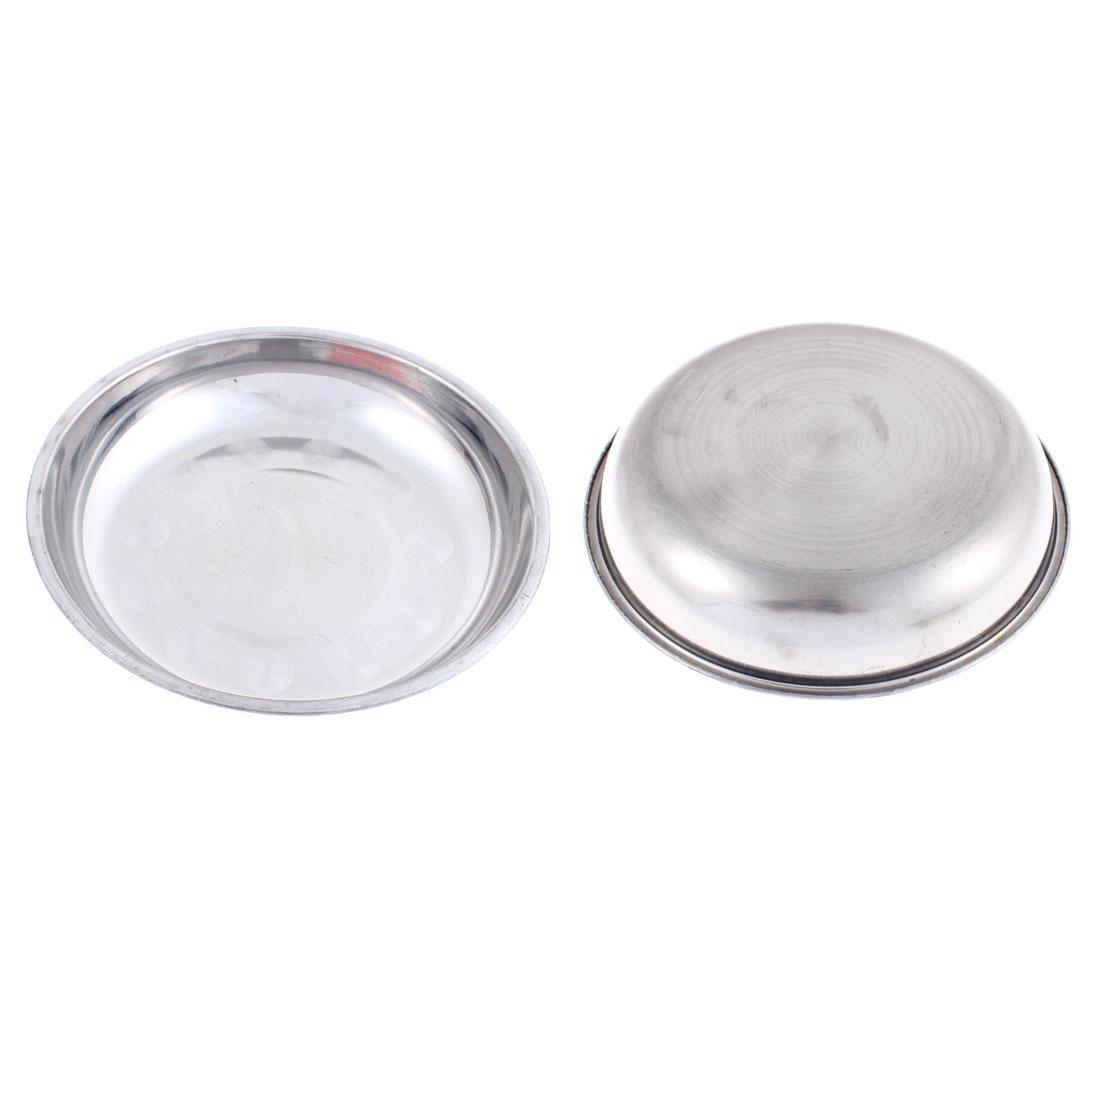 Kitchen Dinner Dish Food Plates Silver Tone 20cm x 3cm 2Pcs